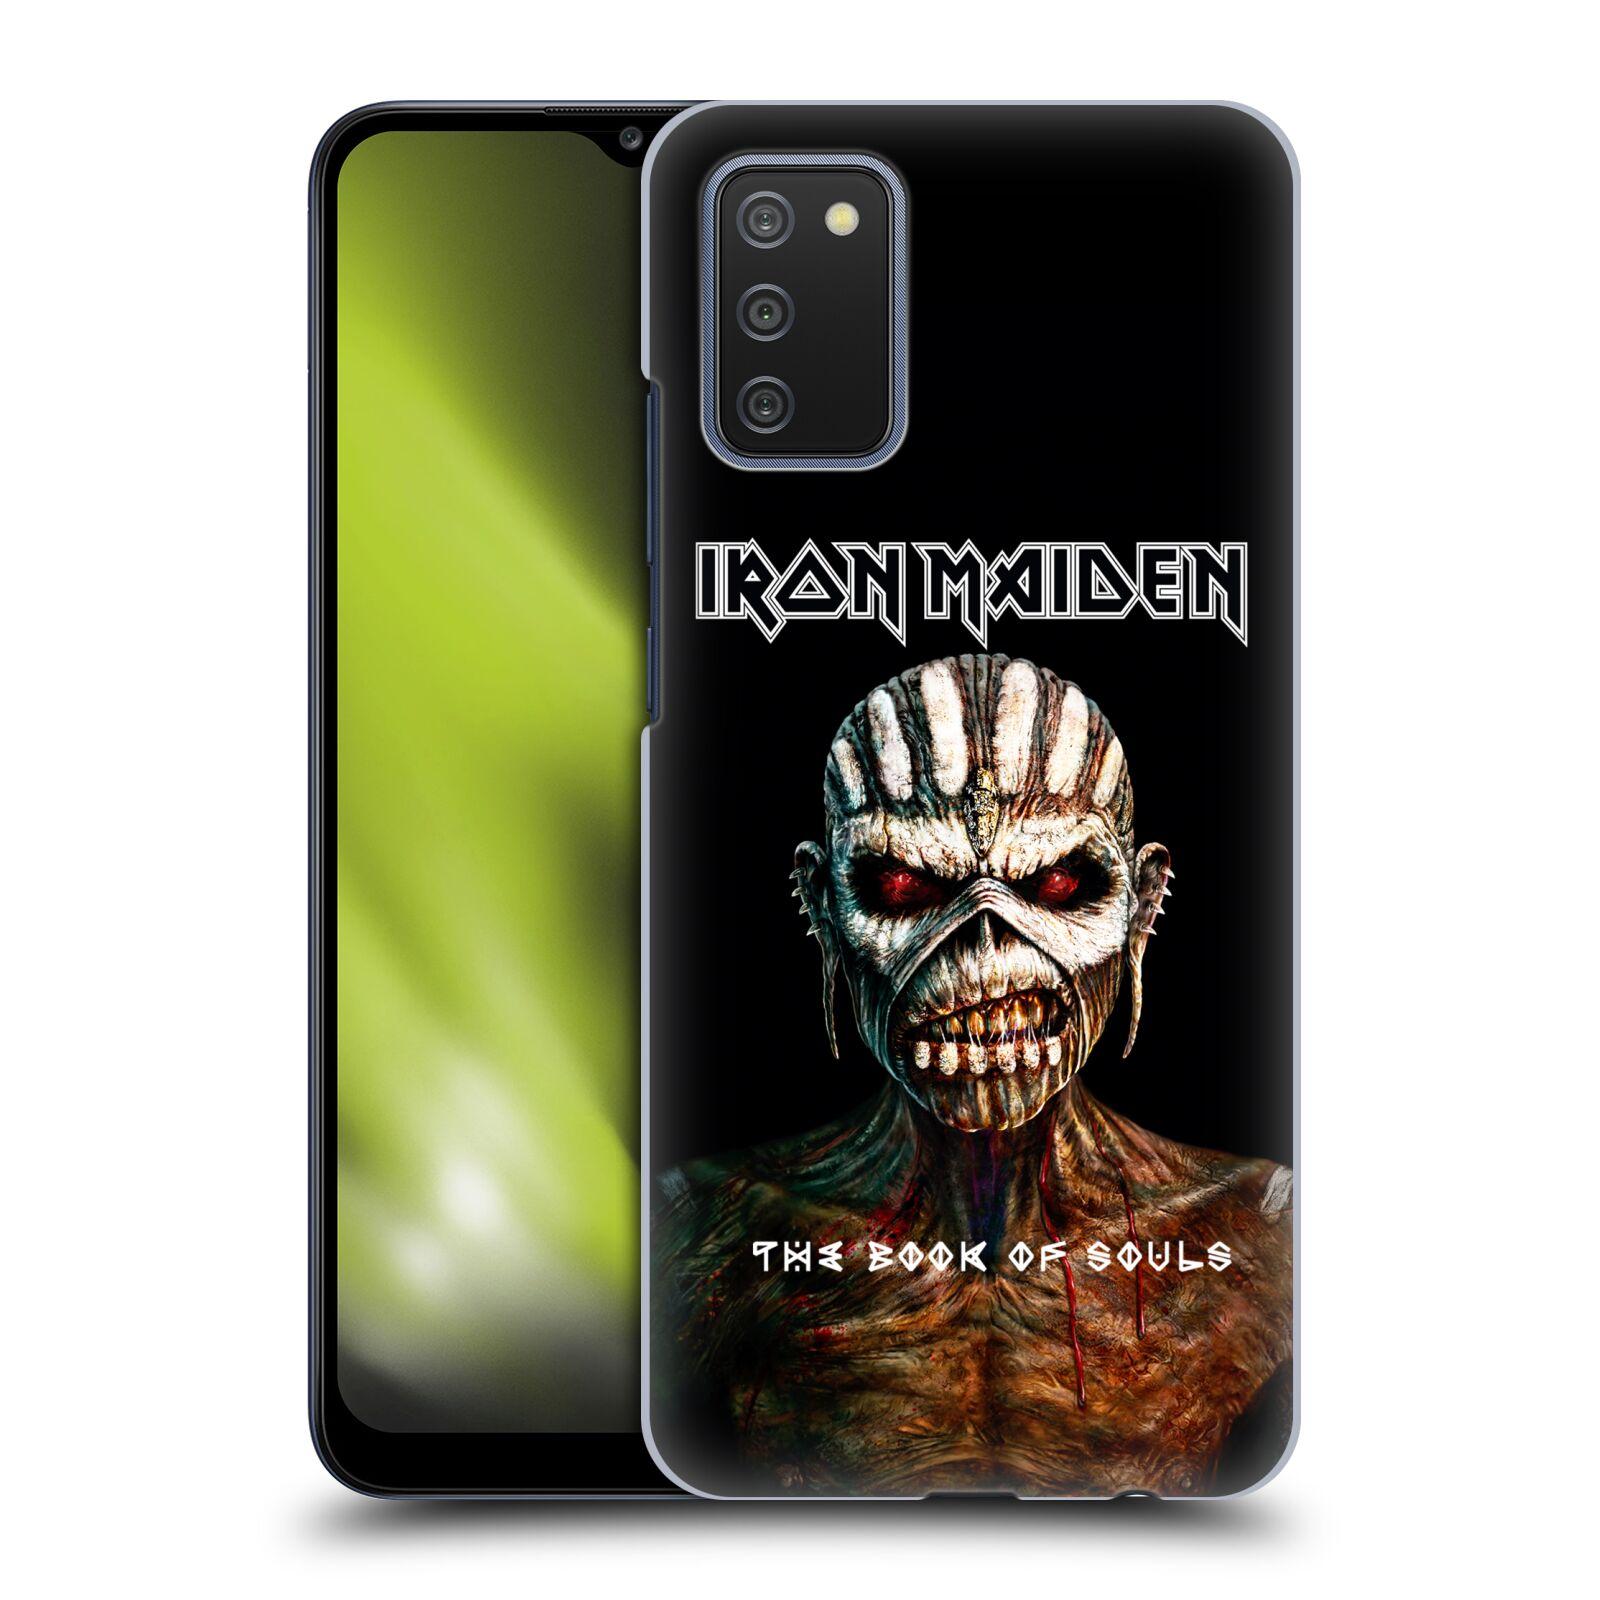 Plastové pouzdro na mobil Samsung Galaxy A02s - Head Case - Iron Maiden - The Book Of Souls